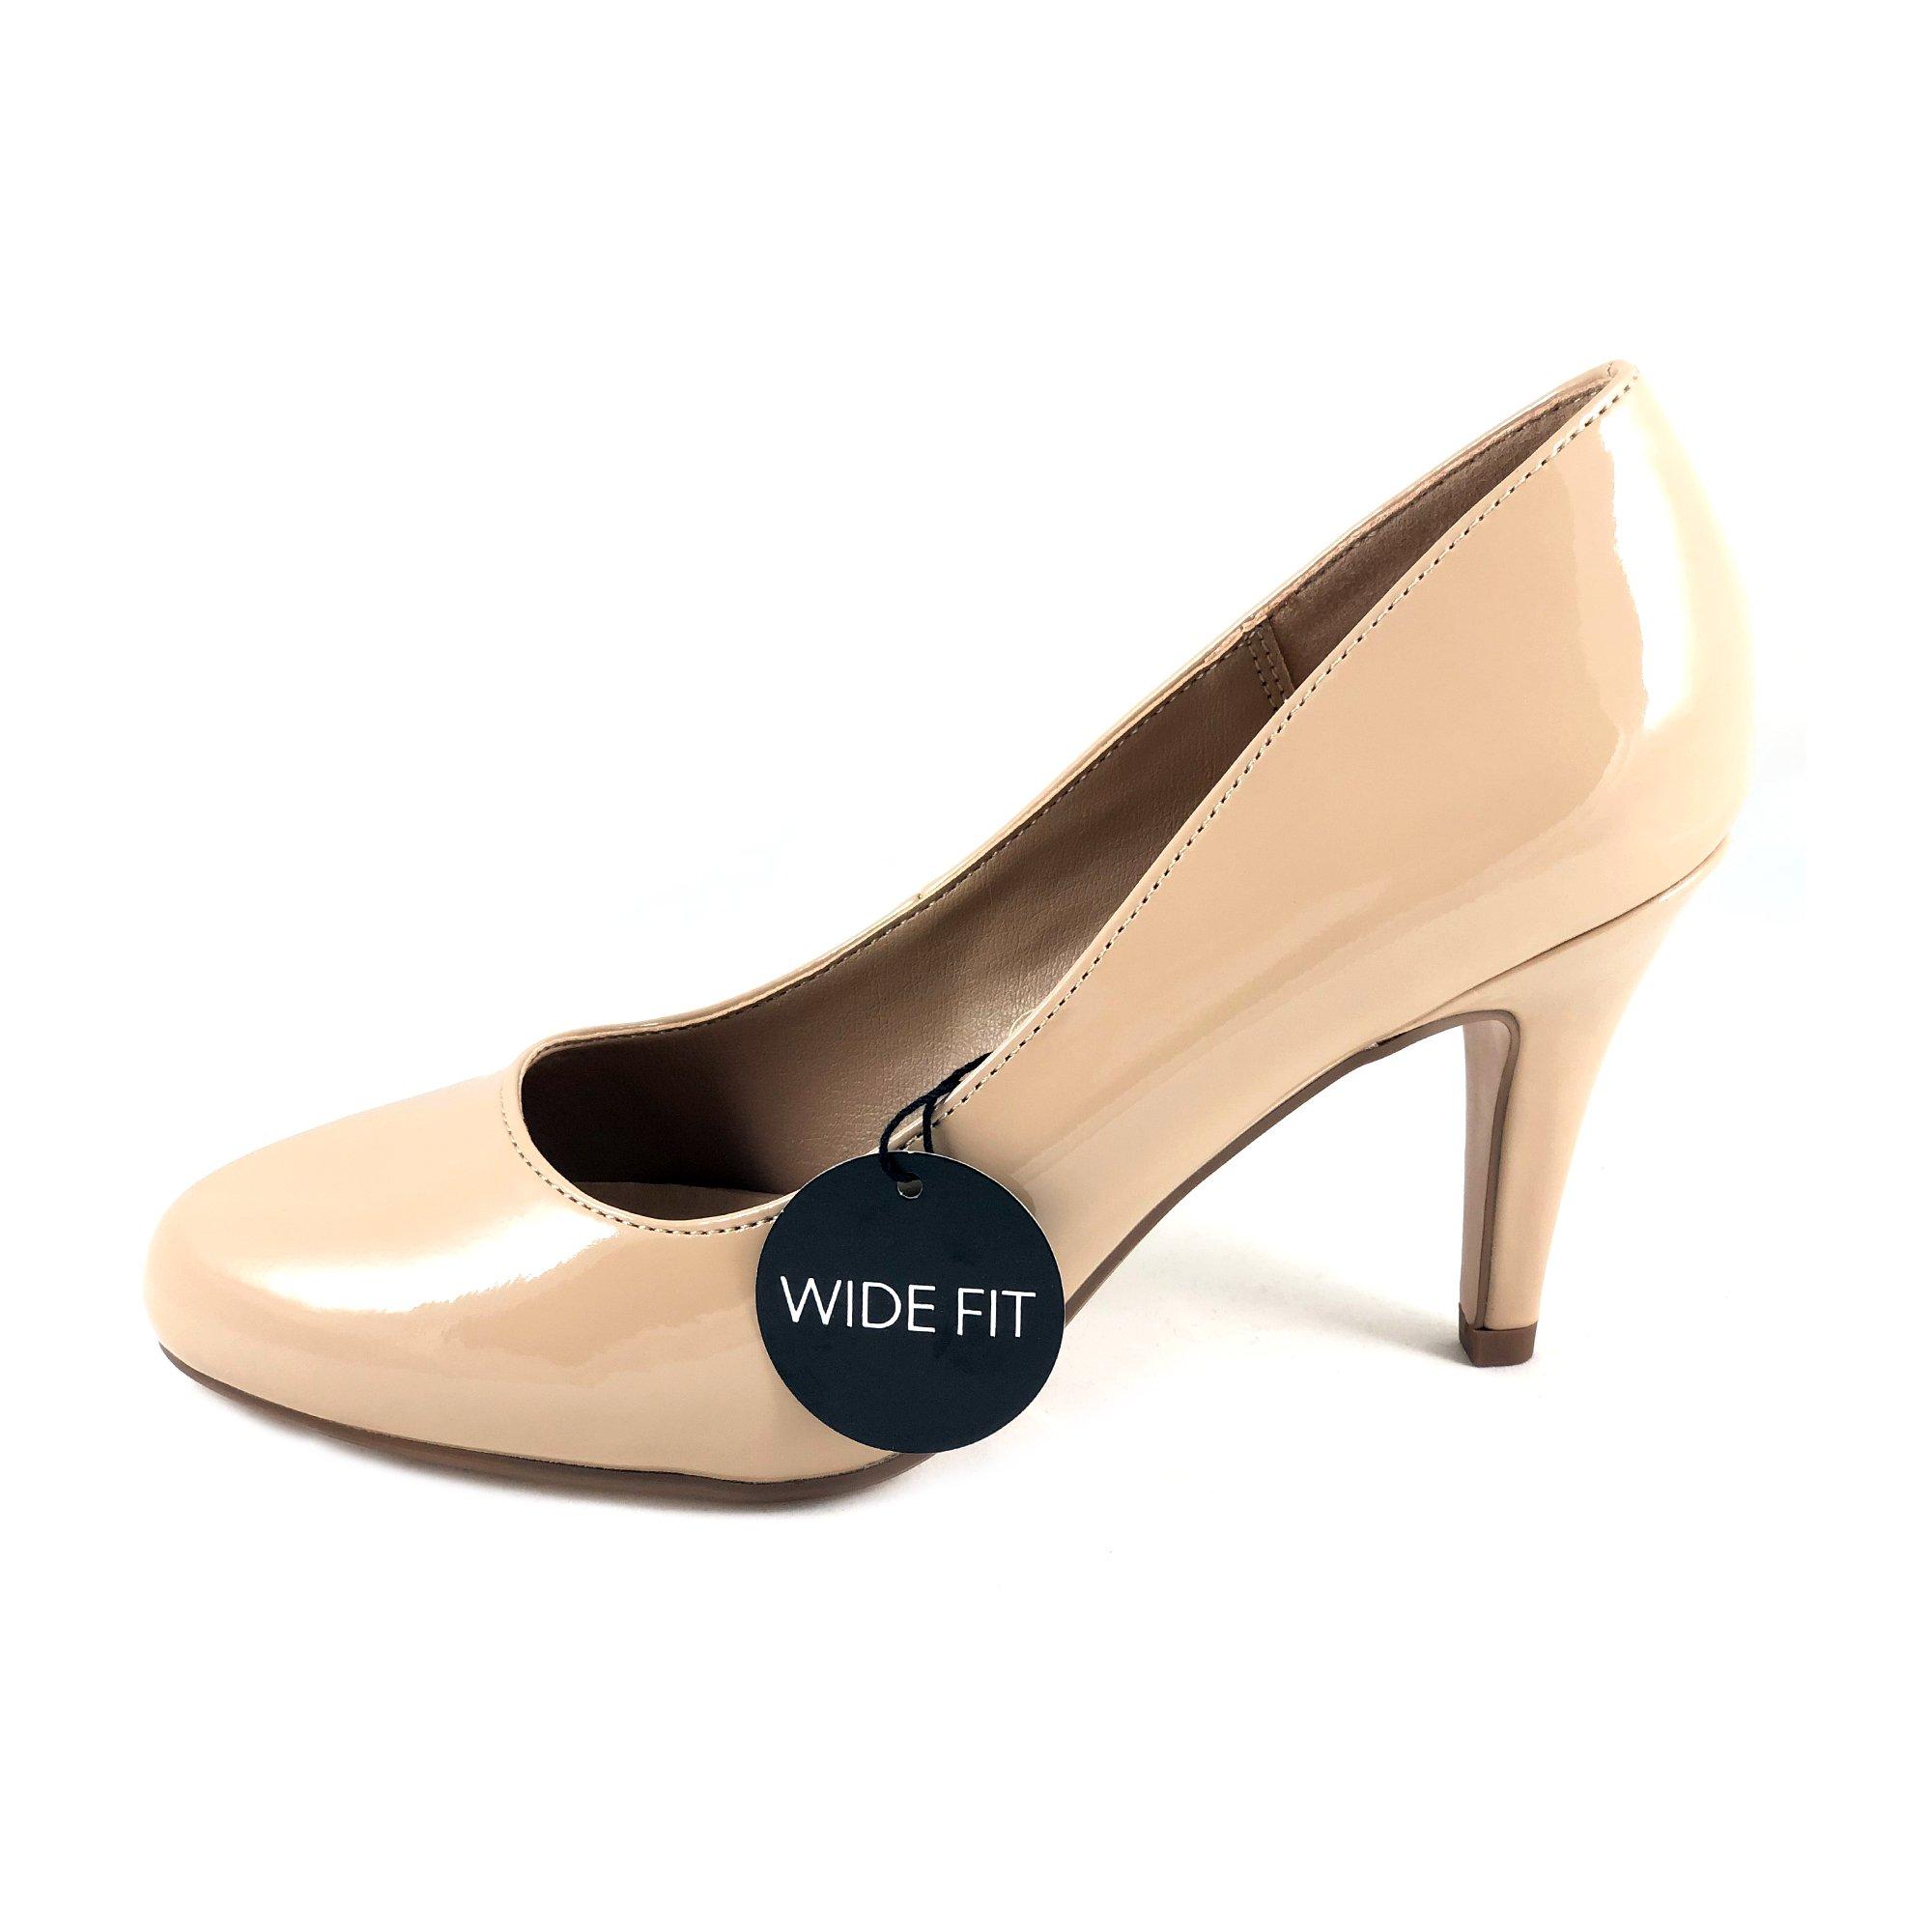 City Classified Guide Round Toe High Heel Dress Pump Wide Fit (10 B(M) US, Beige Pat)